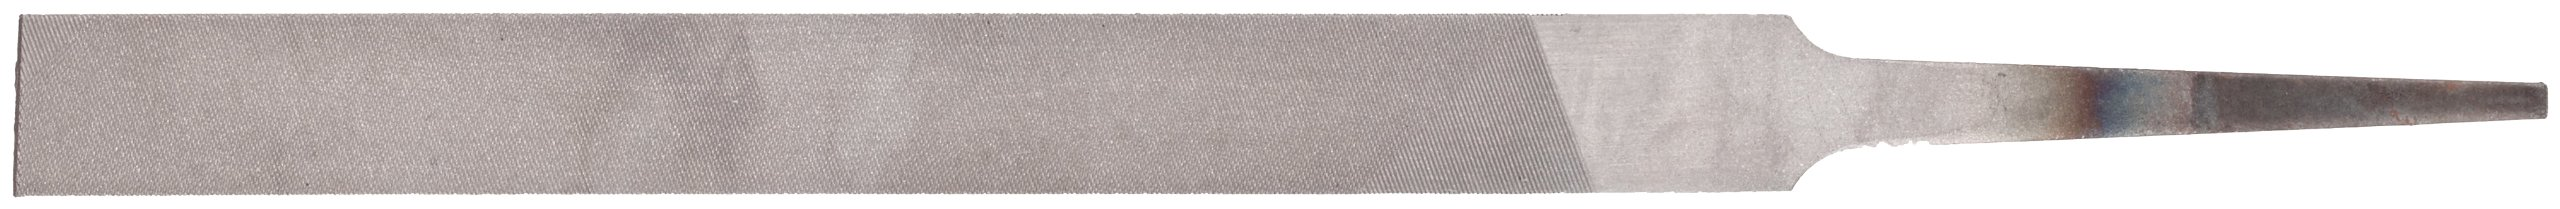 Nicholson Hand File, Swiss Pattern, Double Cut, Rectangular, #2 Coarseness, 4'' Length